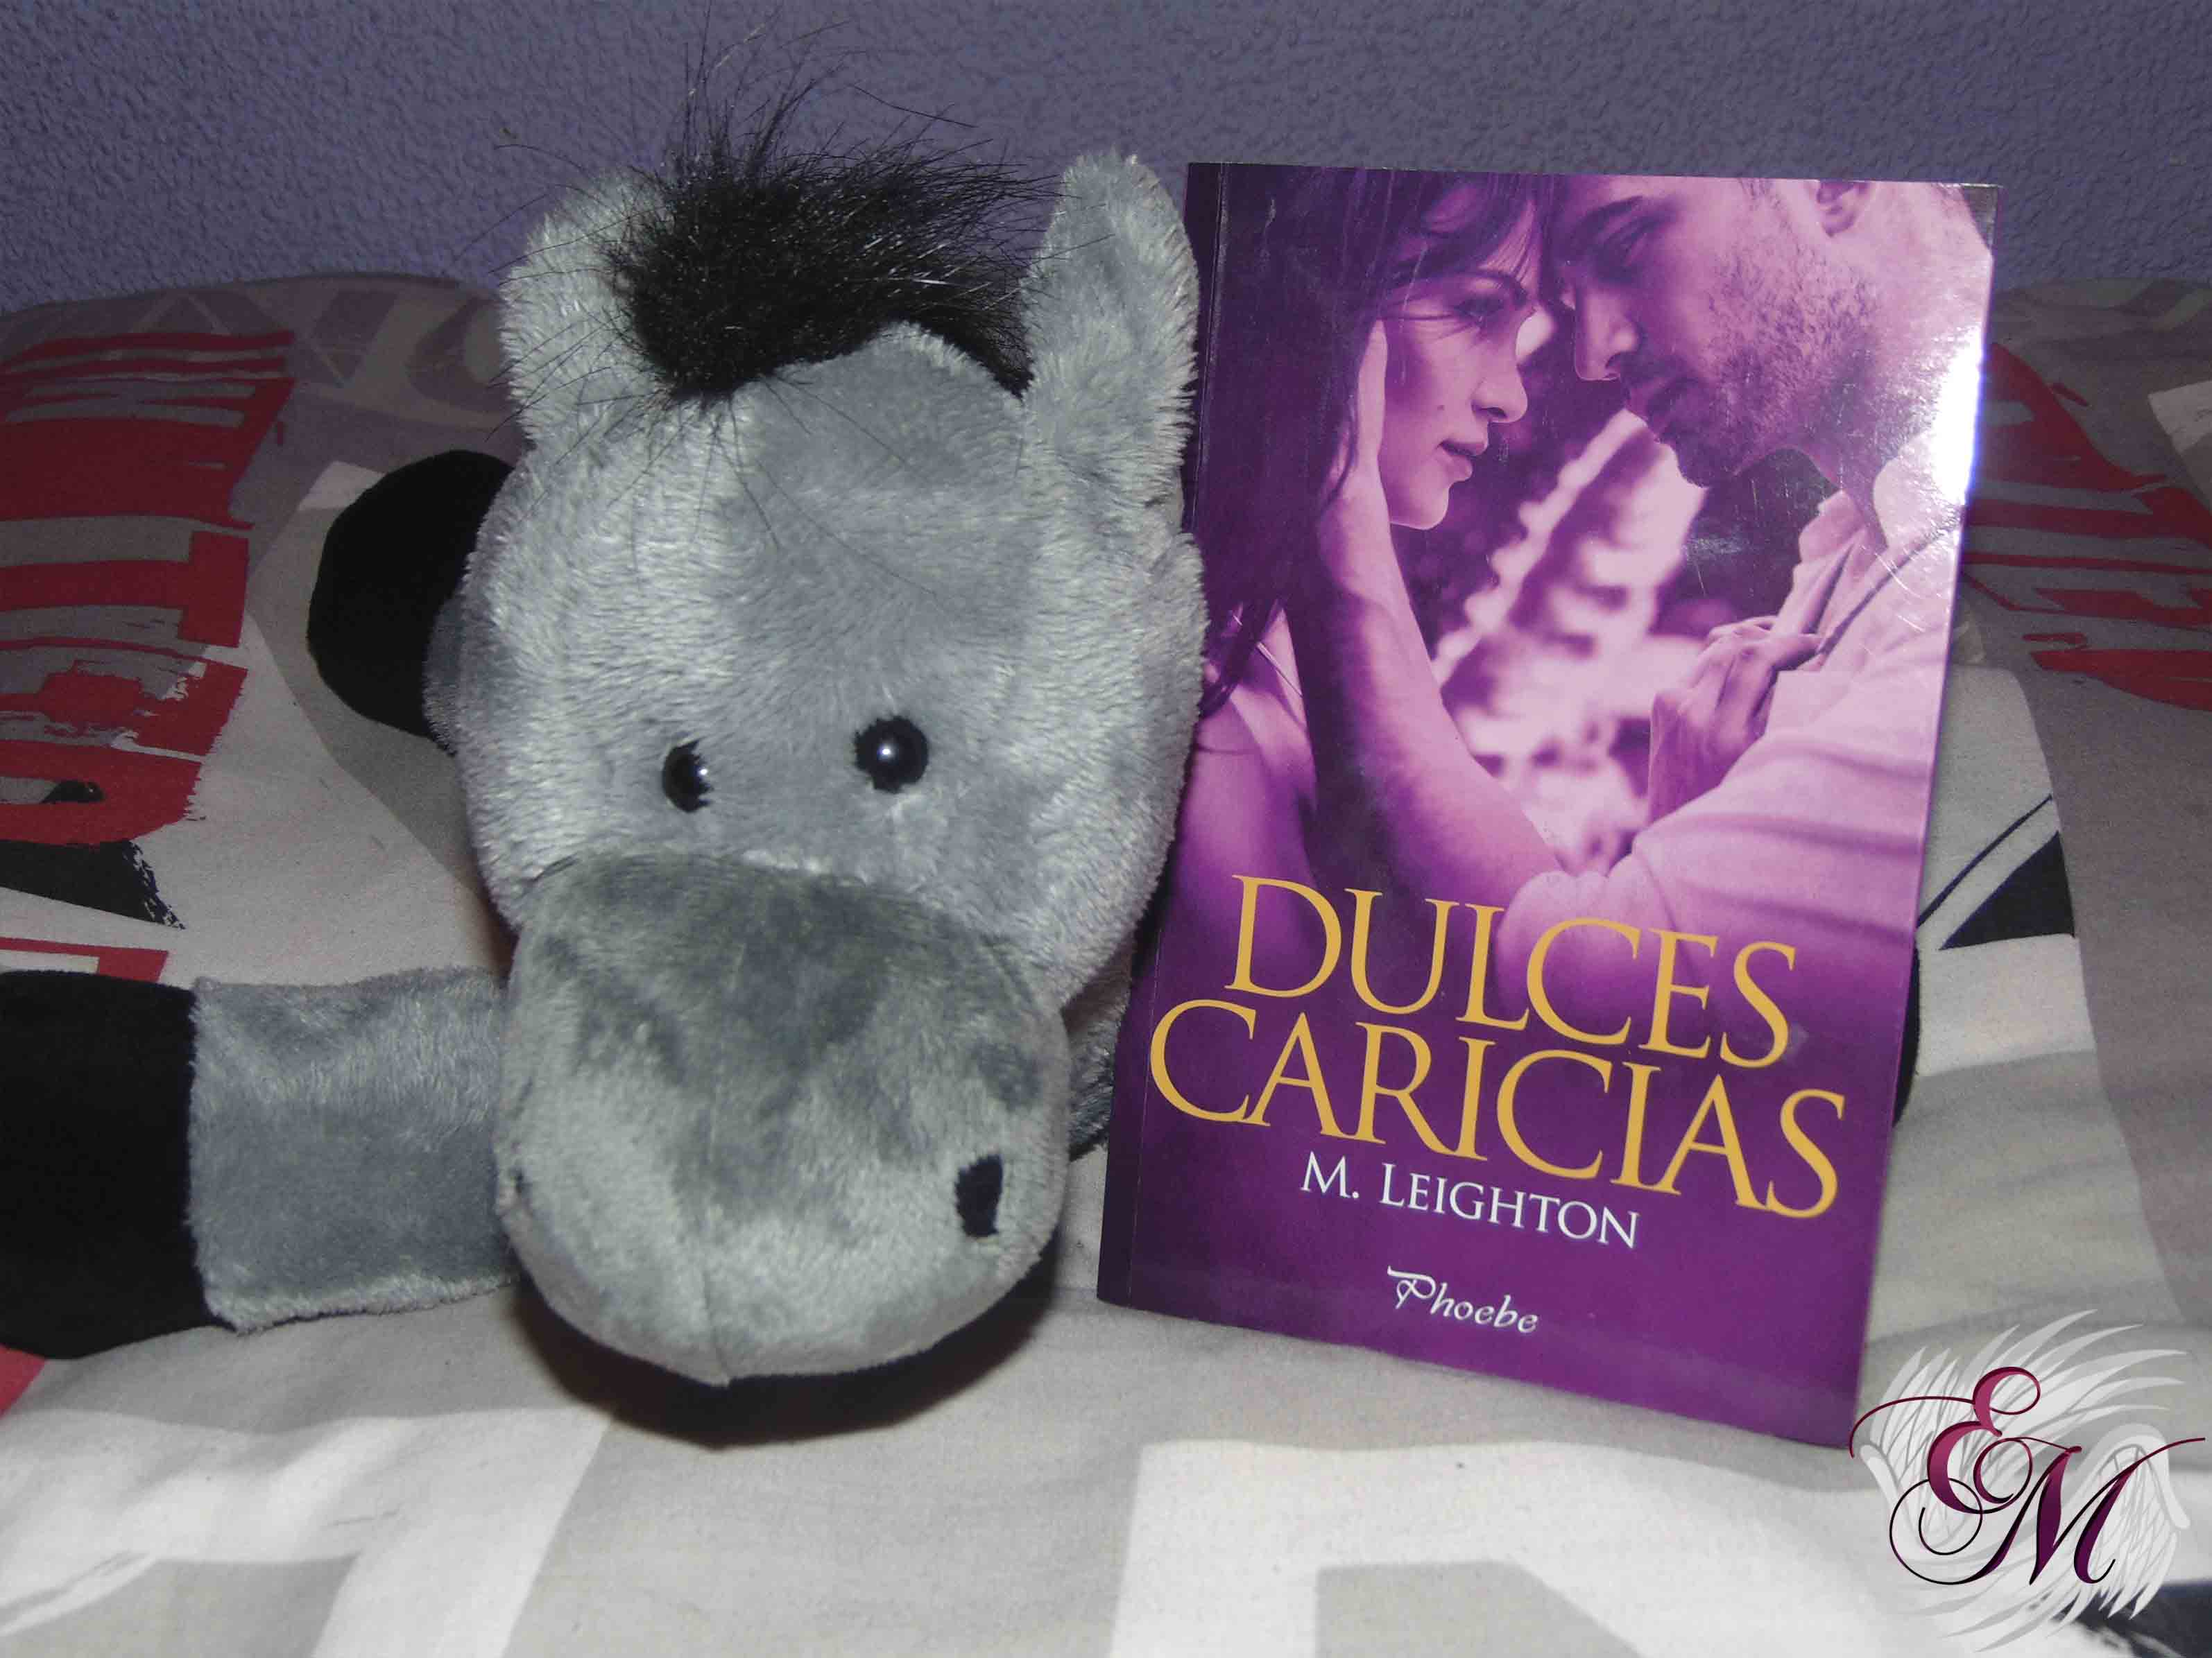 Dulces caricias, M.Leighton